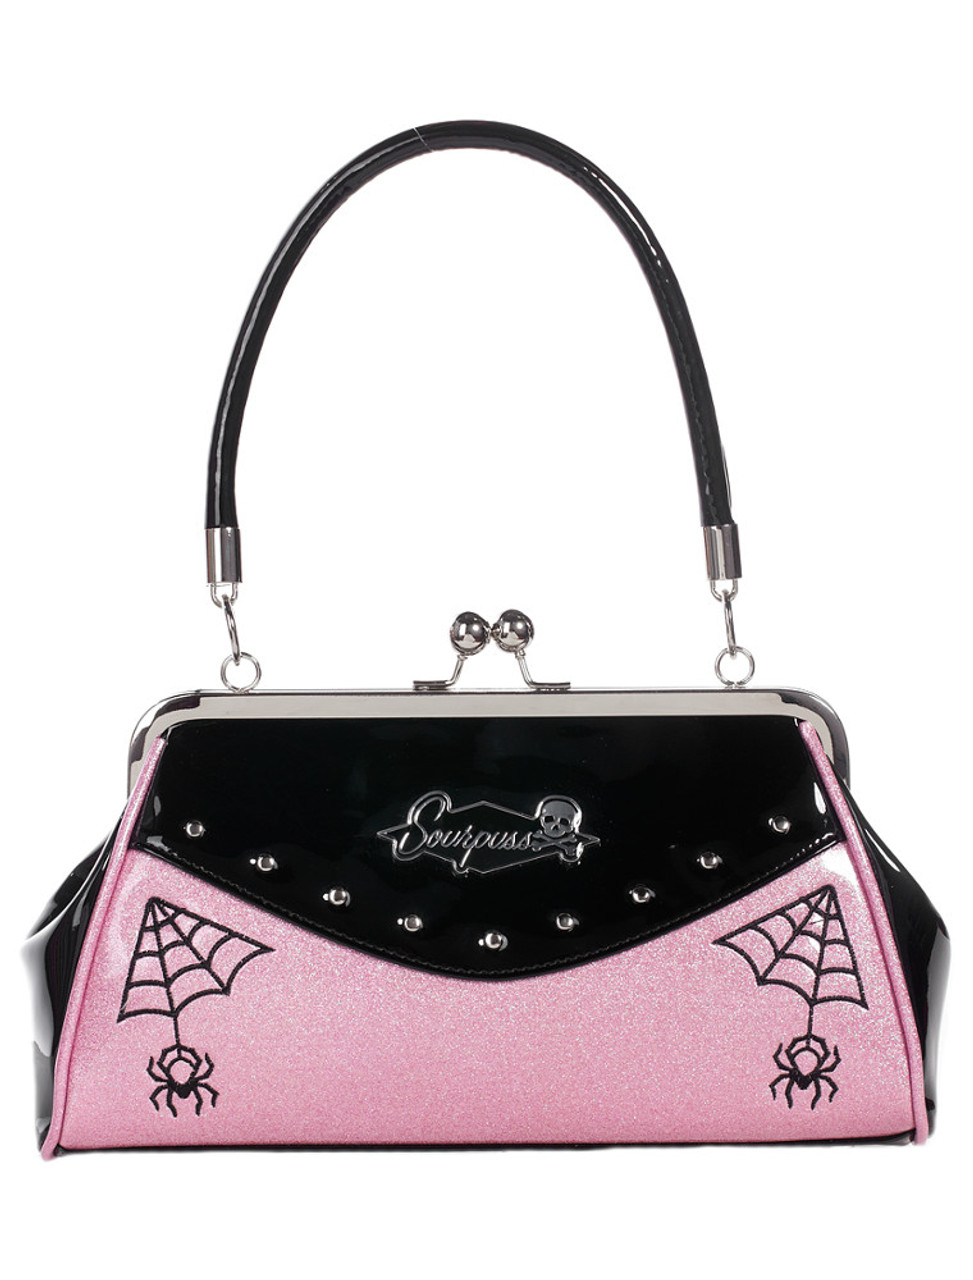 e0cf67f7c228 Sourpuss Webbed Widow Handbag: Black and Pink